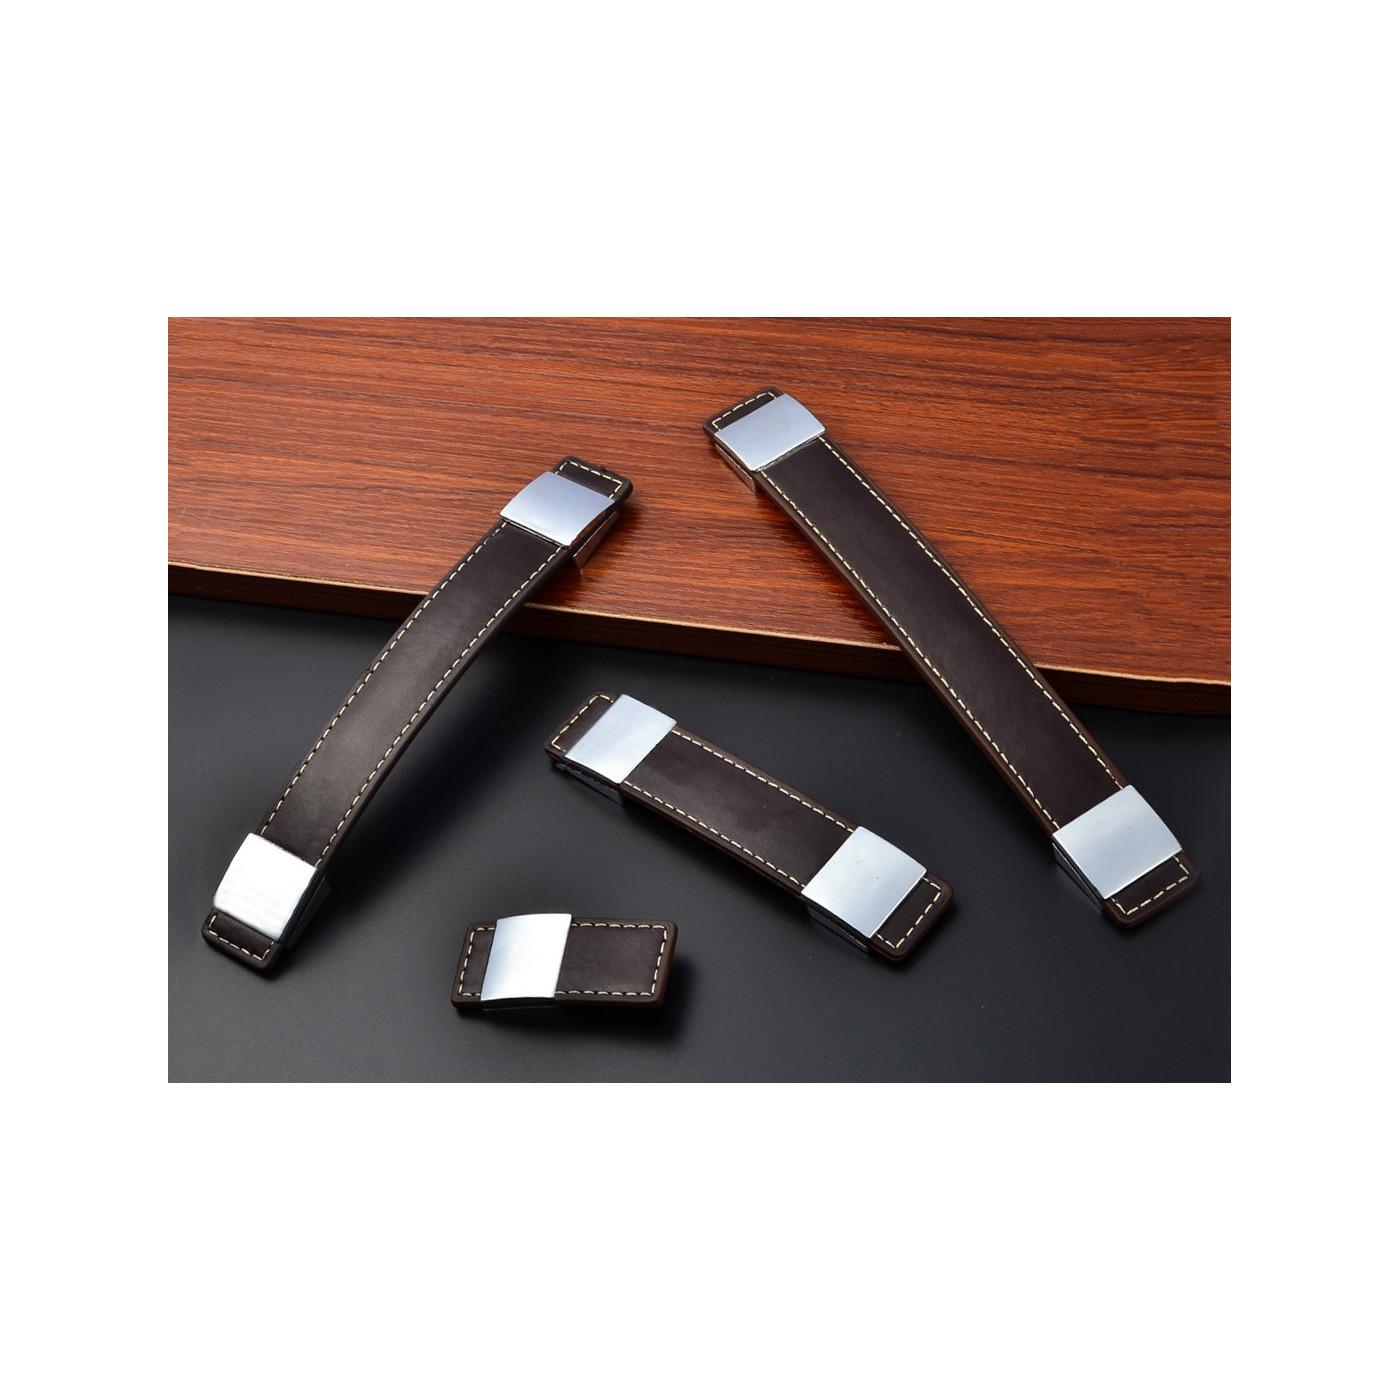 Conjunto de 4 puxadores para móveis de couro, marrom escuro, 242x30 mm  - 1